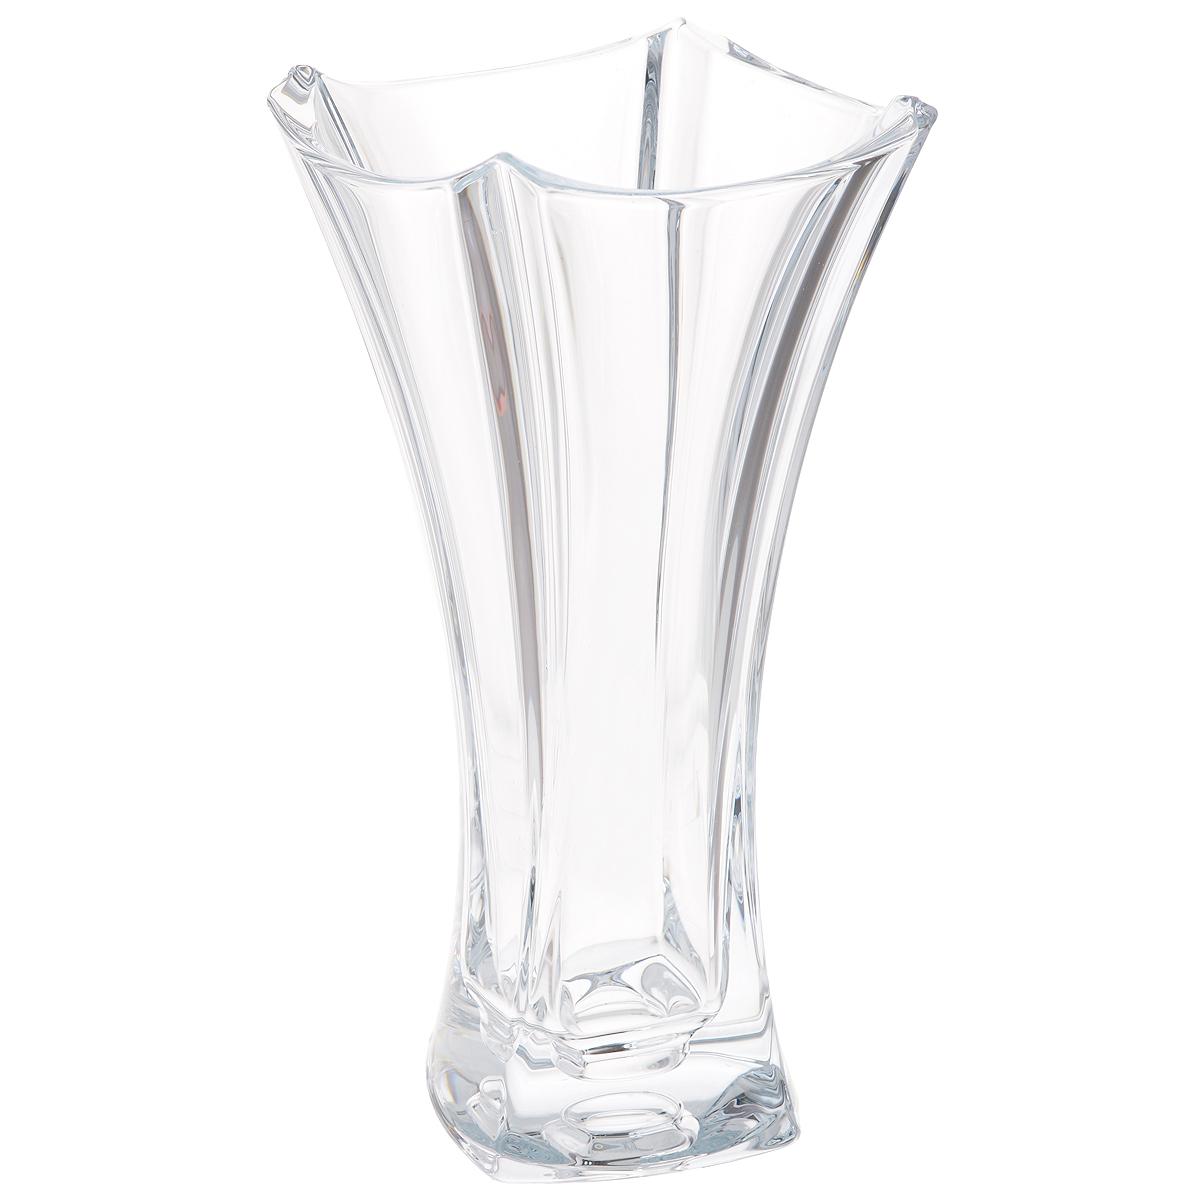 Ваза Crystalite Bohemia Колосеум, высота 35,5 см ваза crystalite bohemia вулкано 30см кристалайт